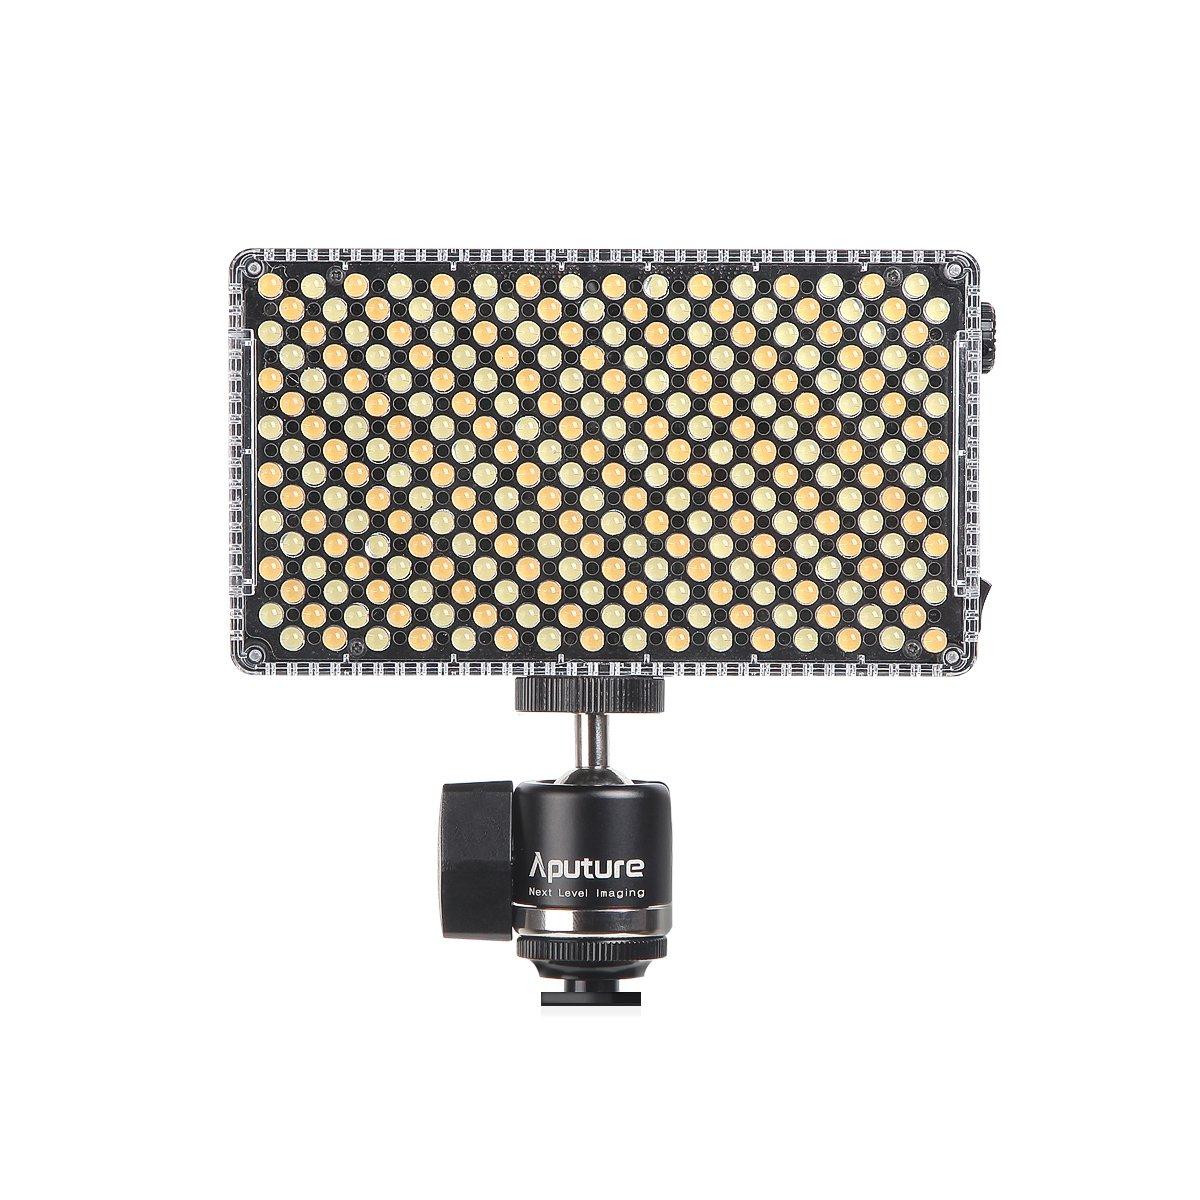 Aputure Amaran AL-F7 3200-9500K CRI/TLCI 95 LED panel LED video camera light (Aputure H198 Upgrade Version) with DigiKit cleaning cloth